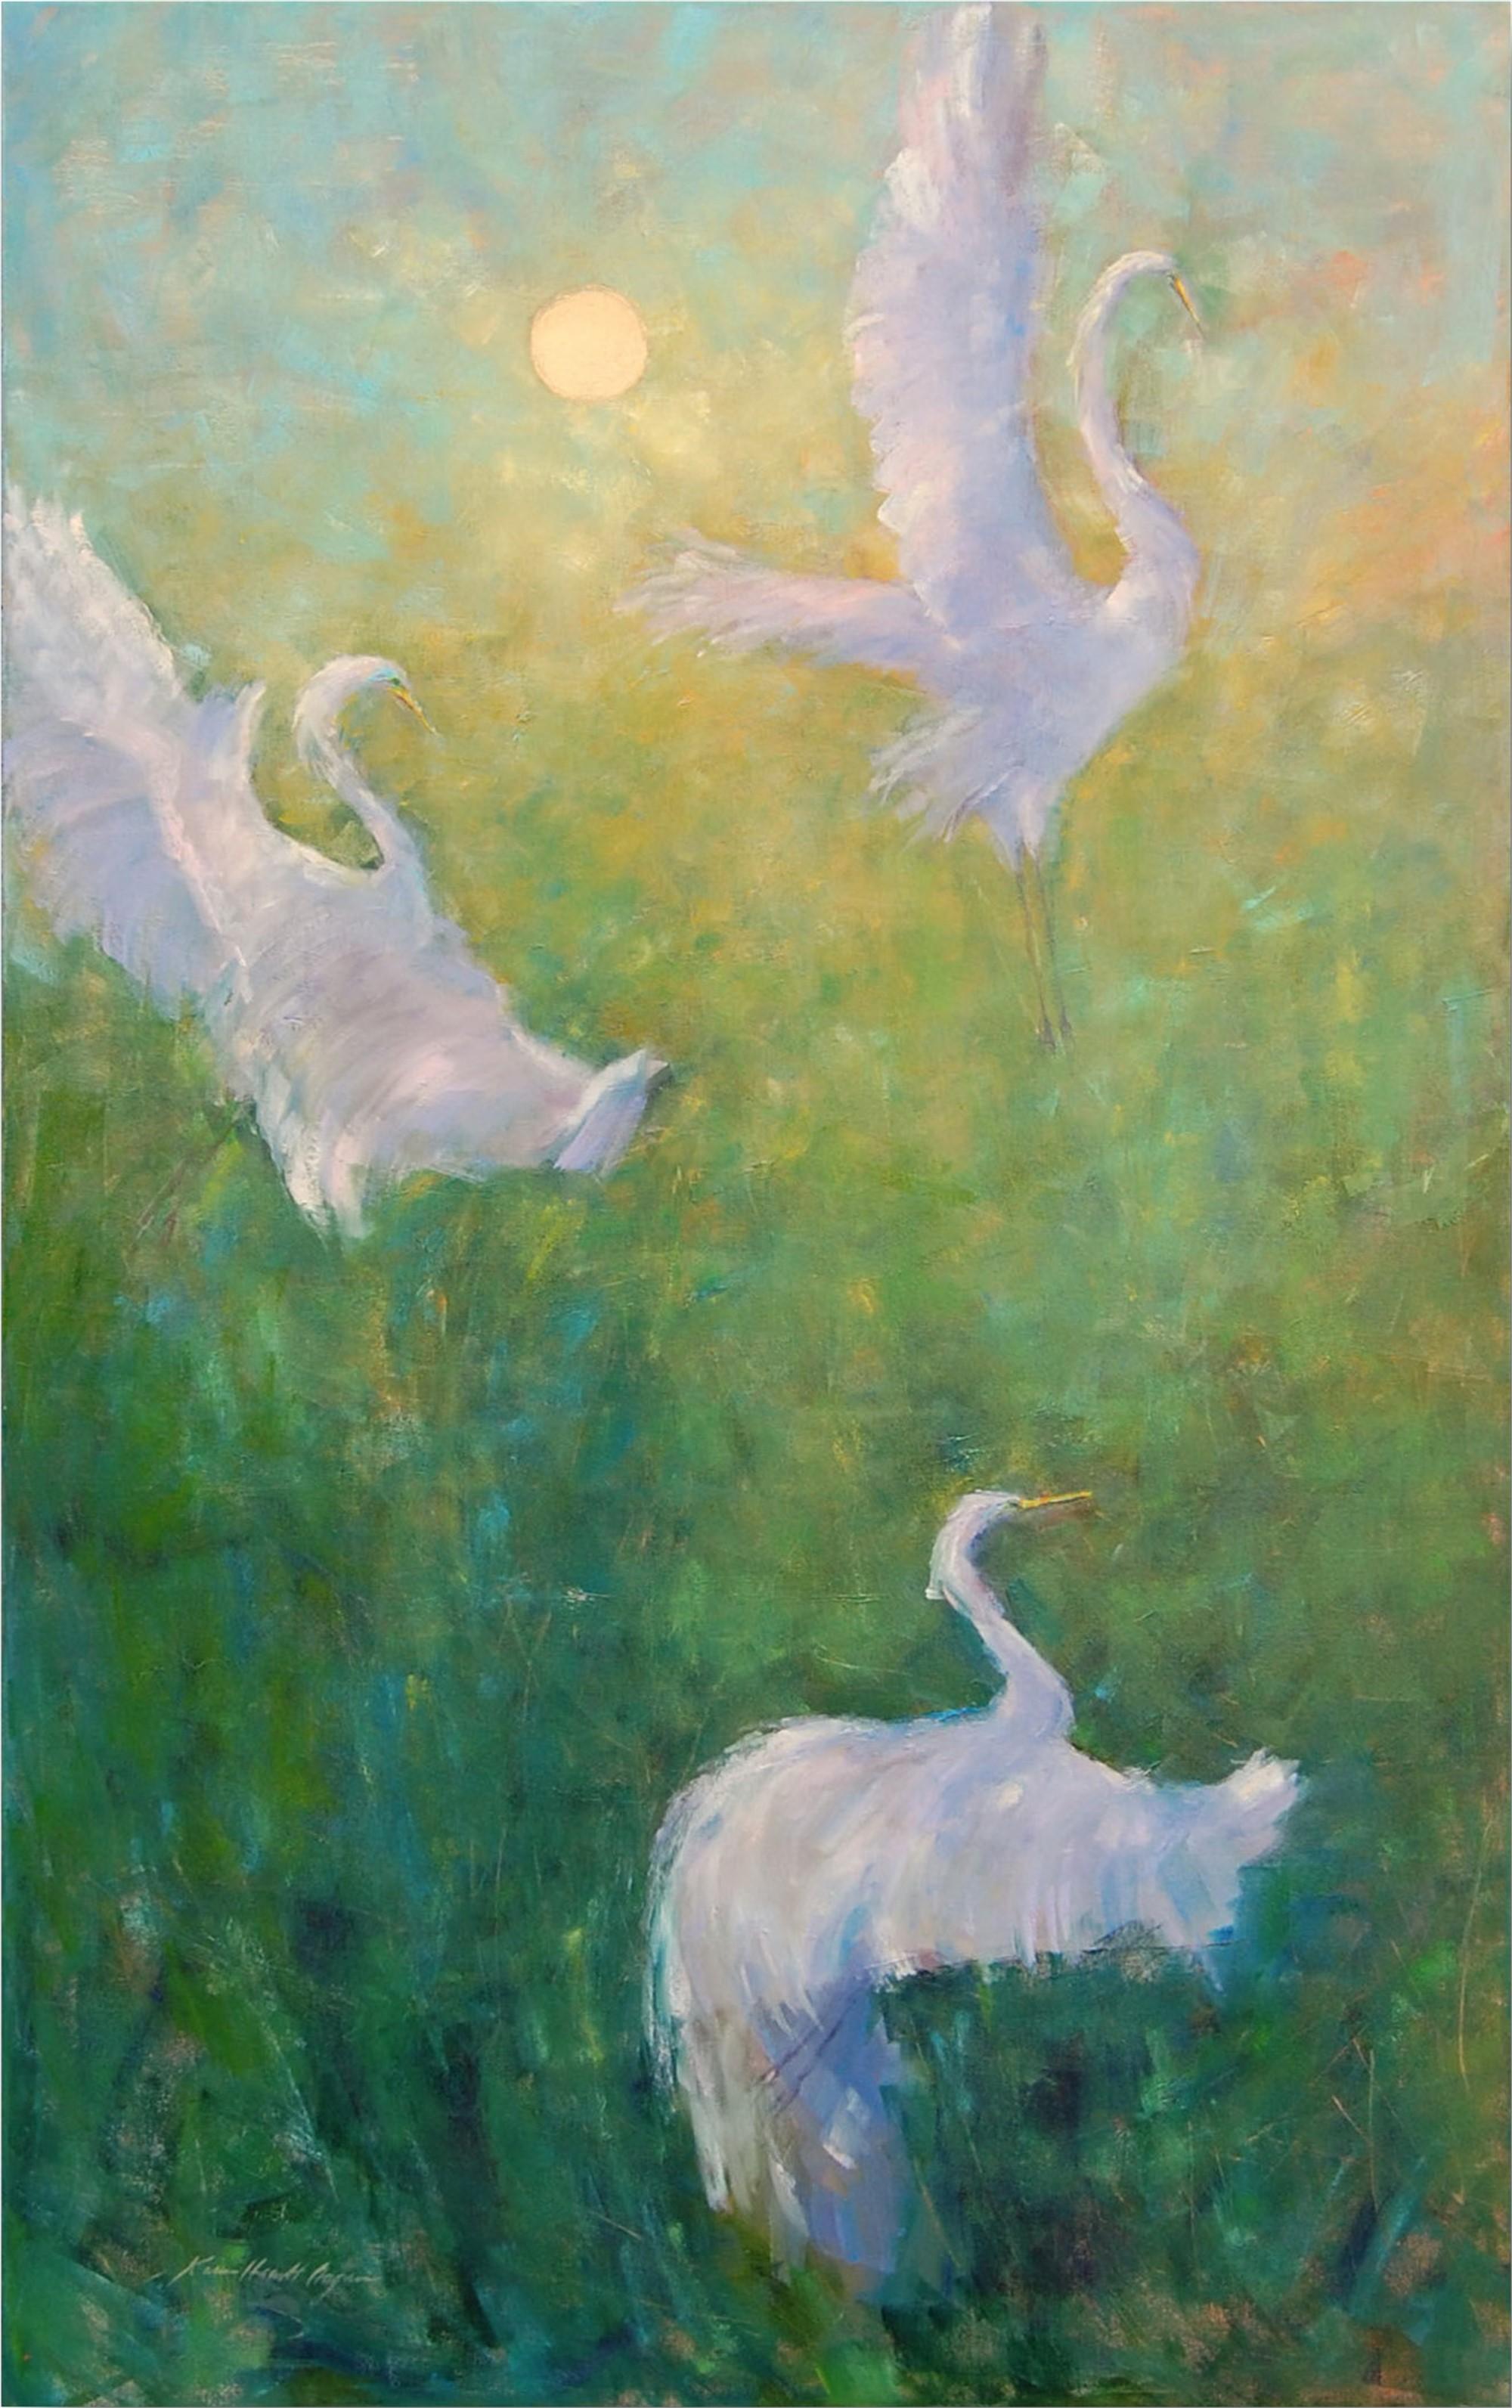 Ascent of the Great Egret I by Karen Hewitt Hagan